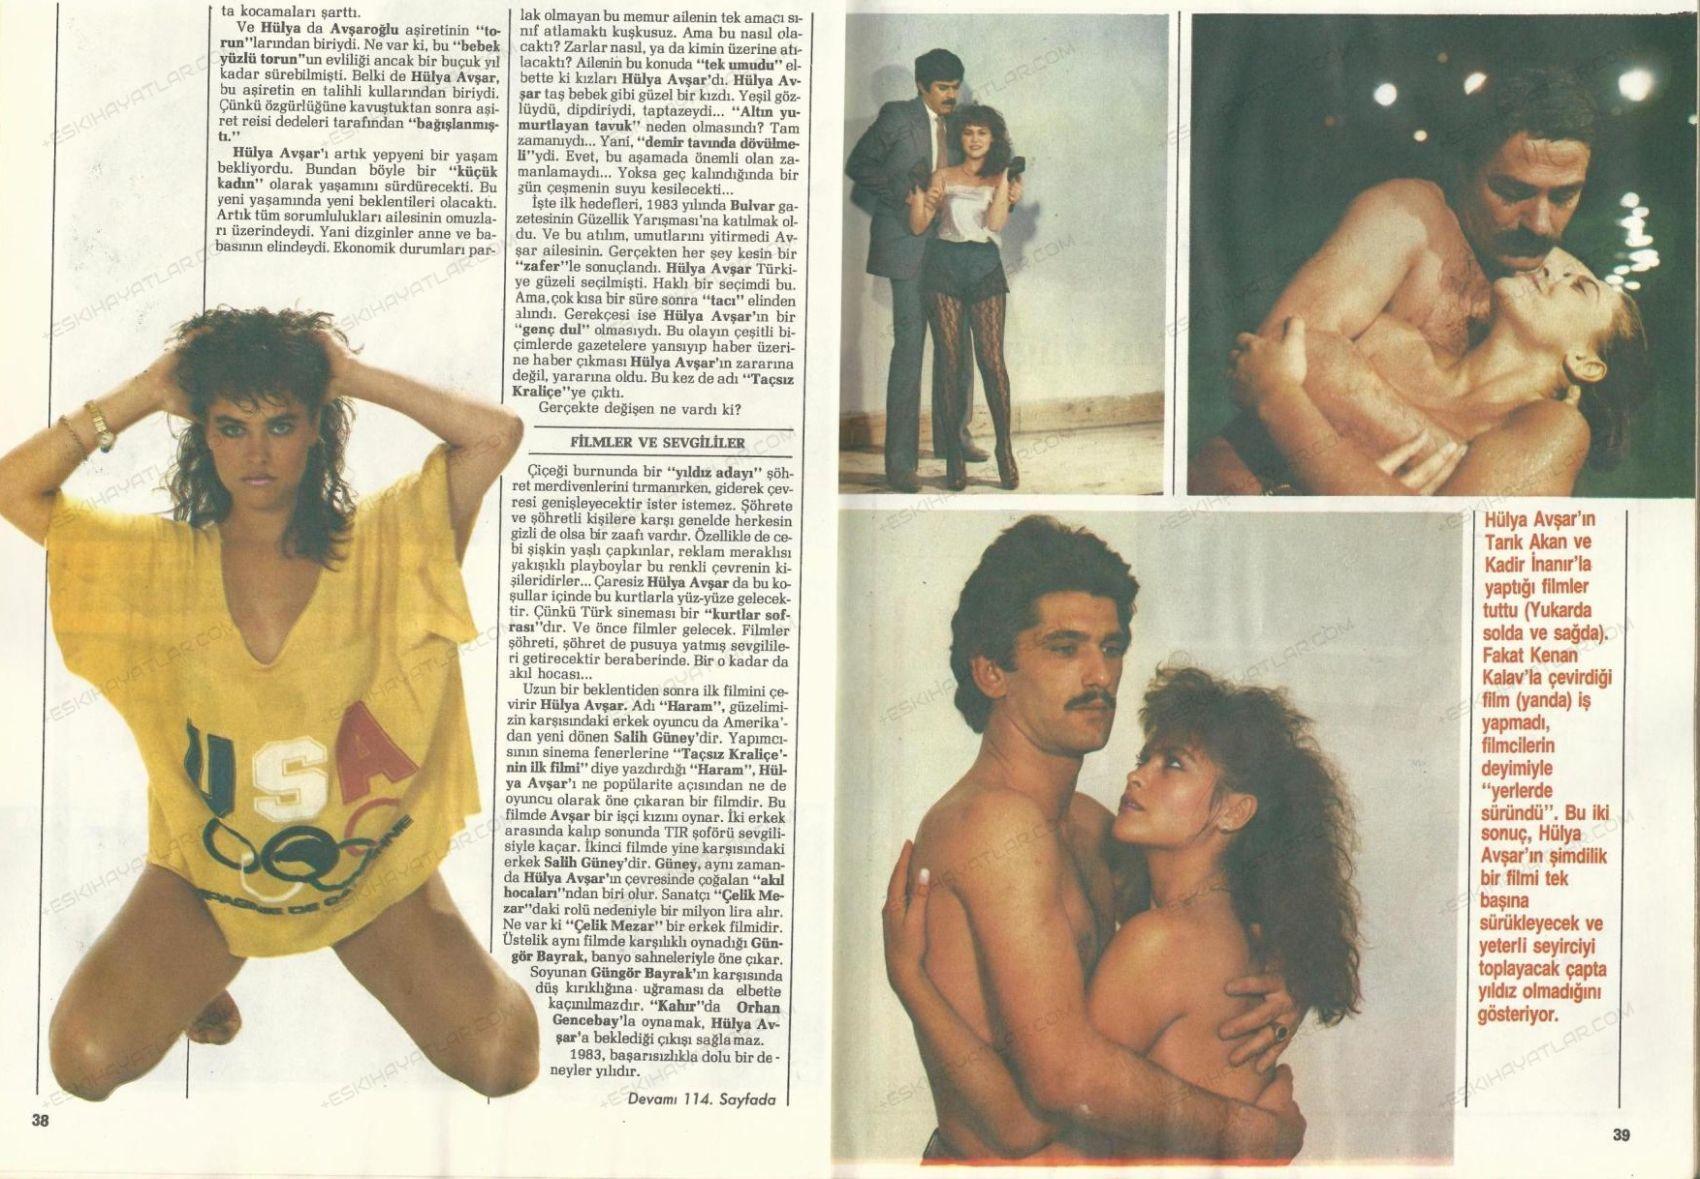 0405-hulya-avsar-1985-erkekce-dergisi-tele-kizlar-filmi-fotograflari-tarik-akan-kenan-kalav-tacsiz-kralice-hulya-avsar (7)